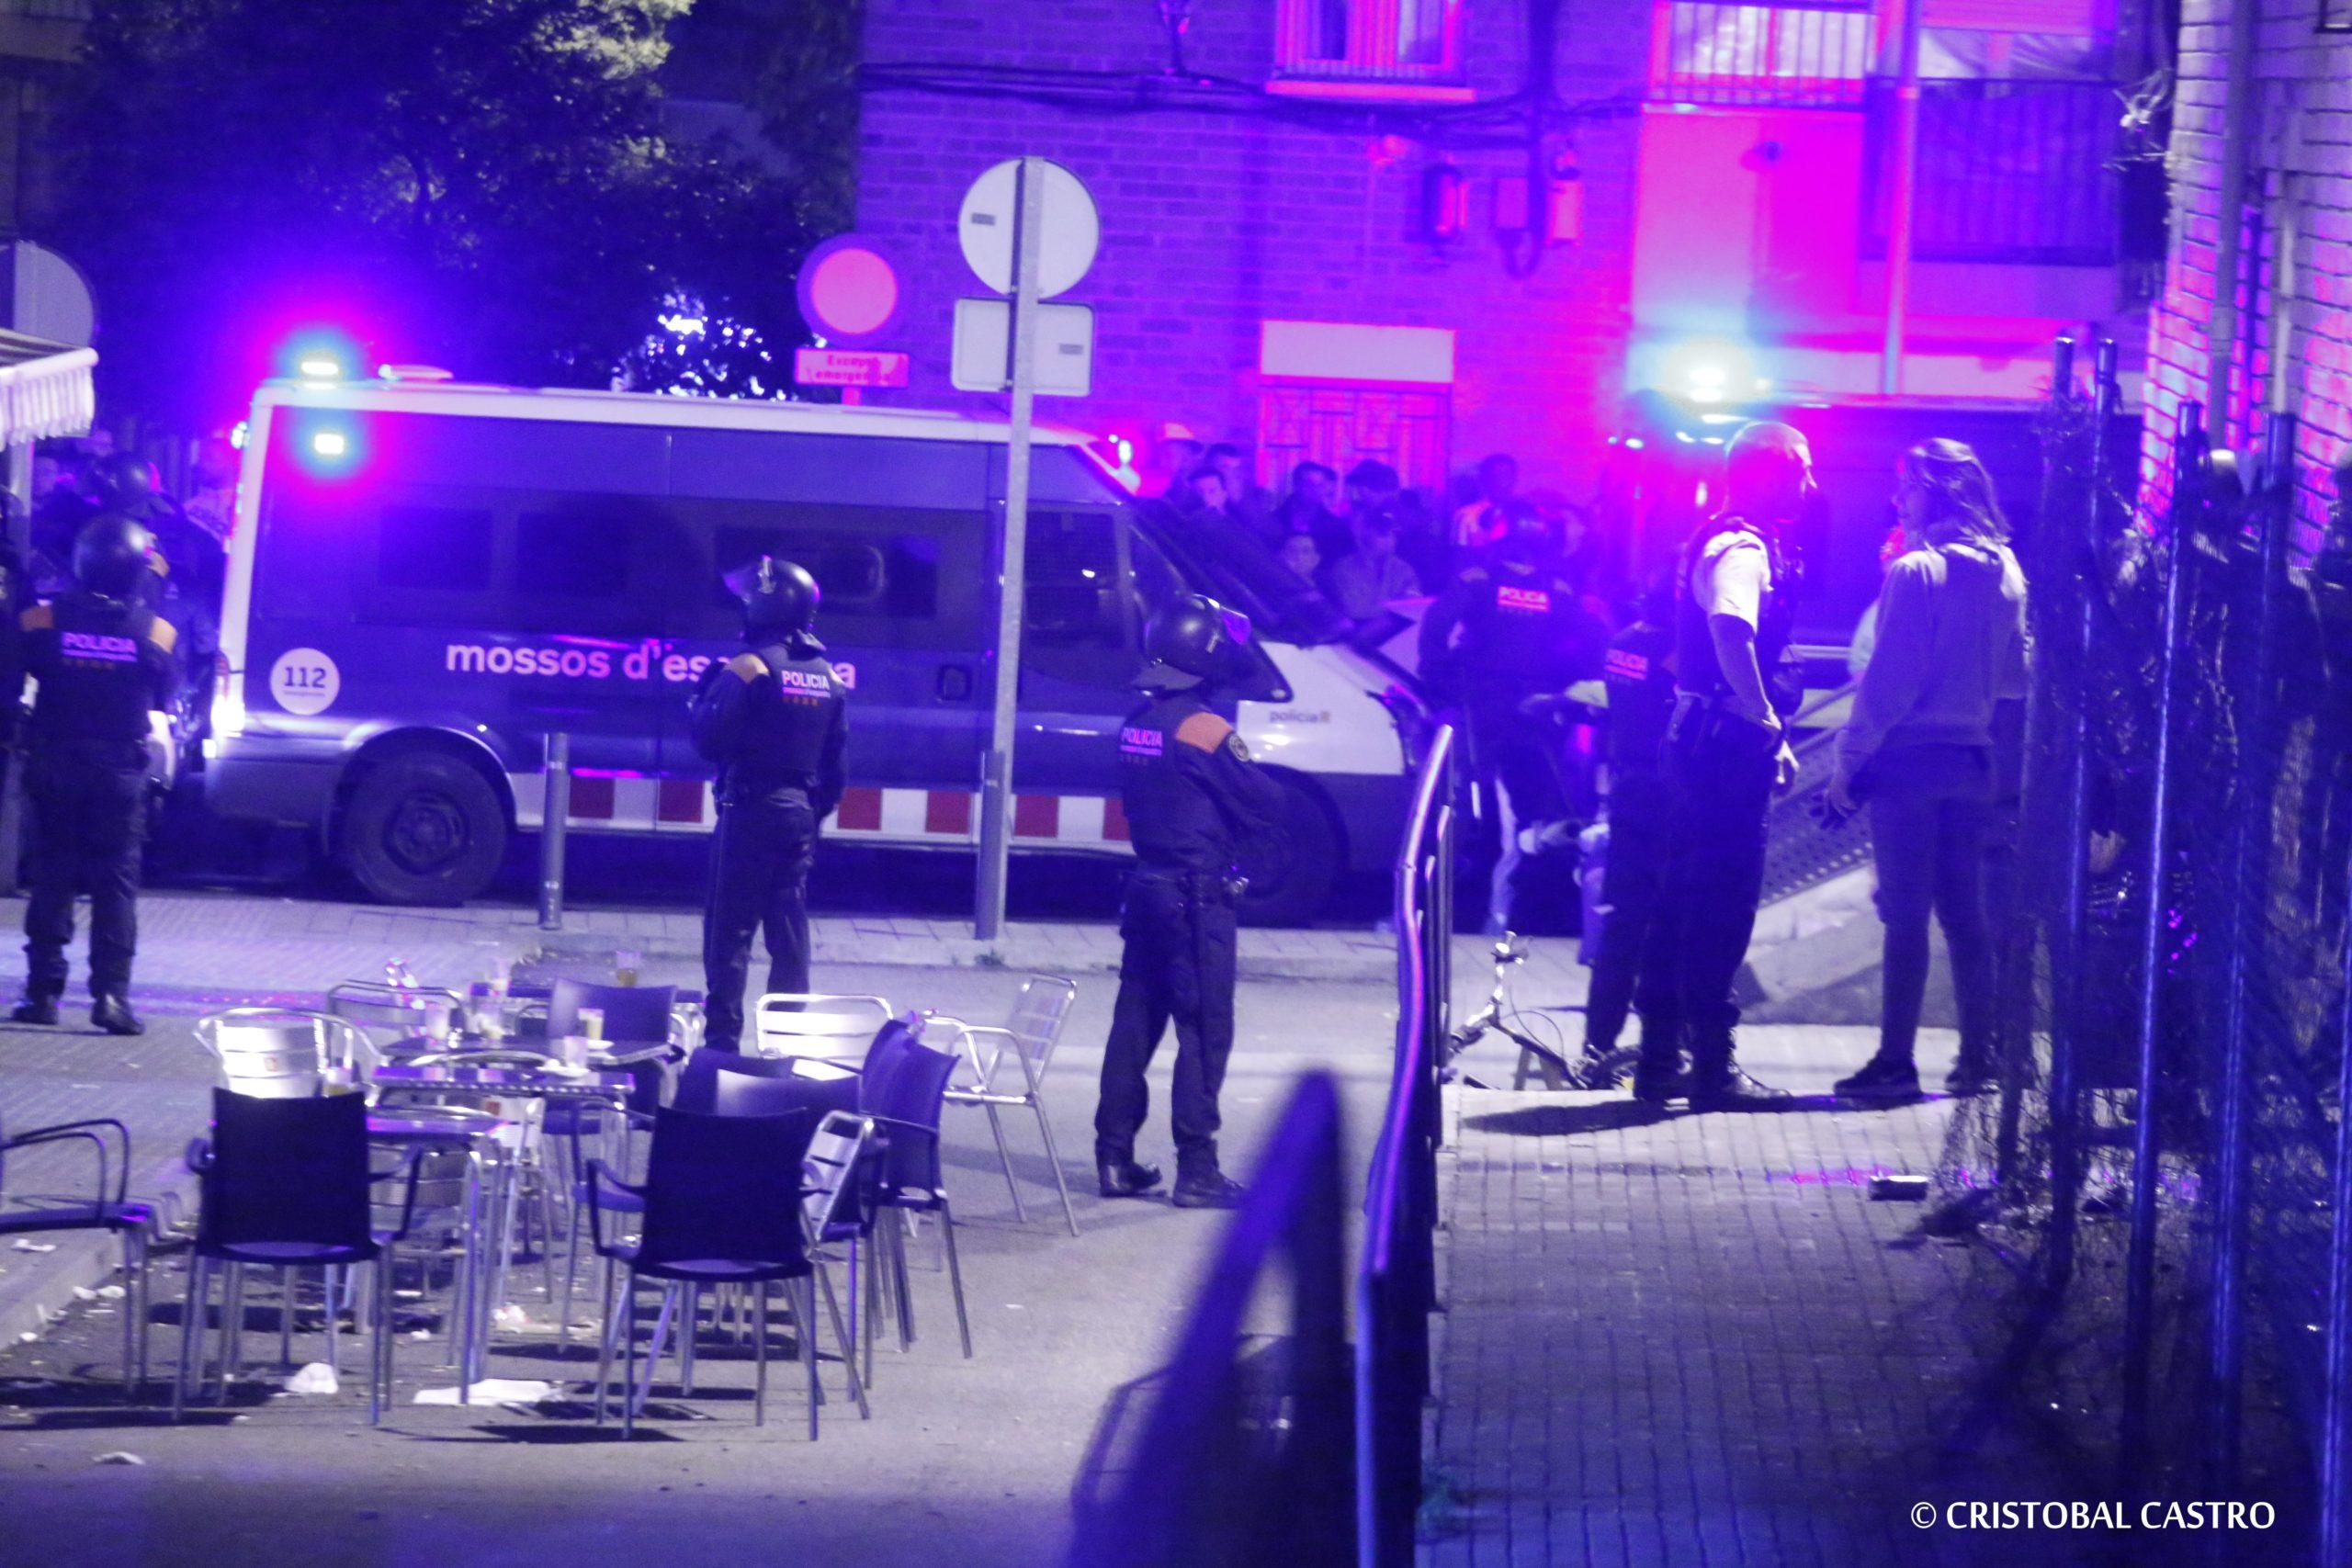 Macrodesplegament policial a Ca n'Anglada